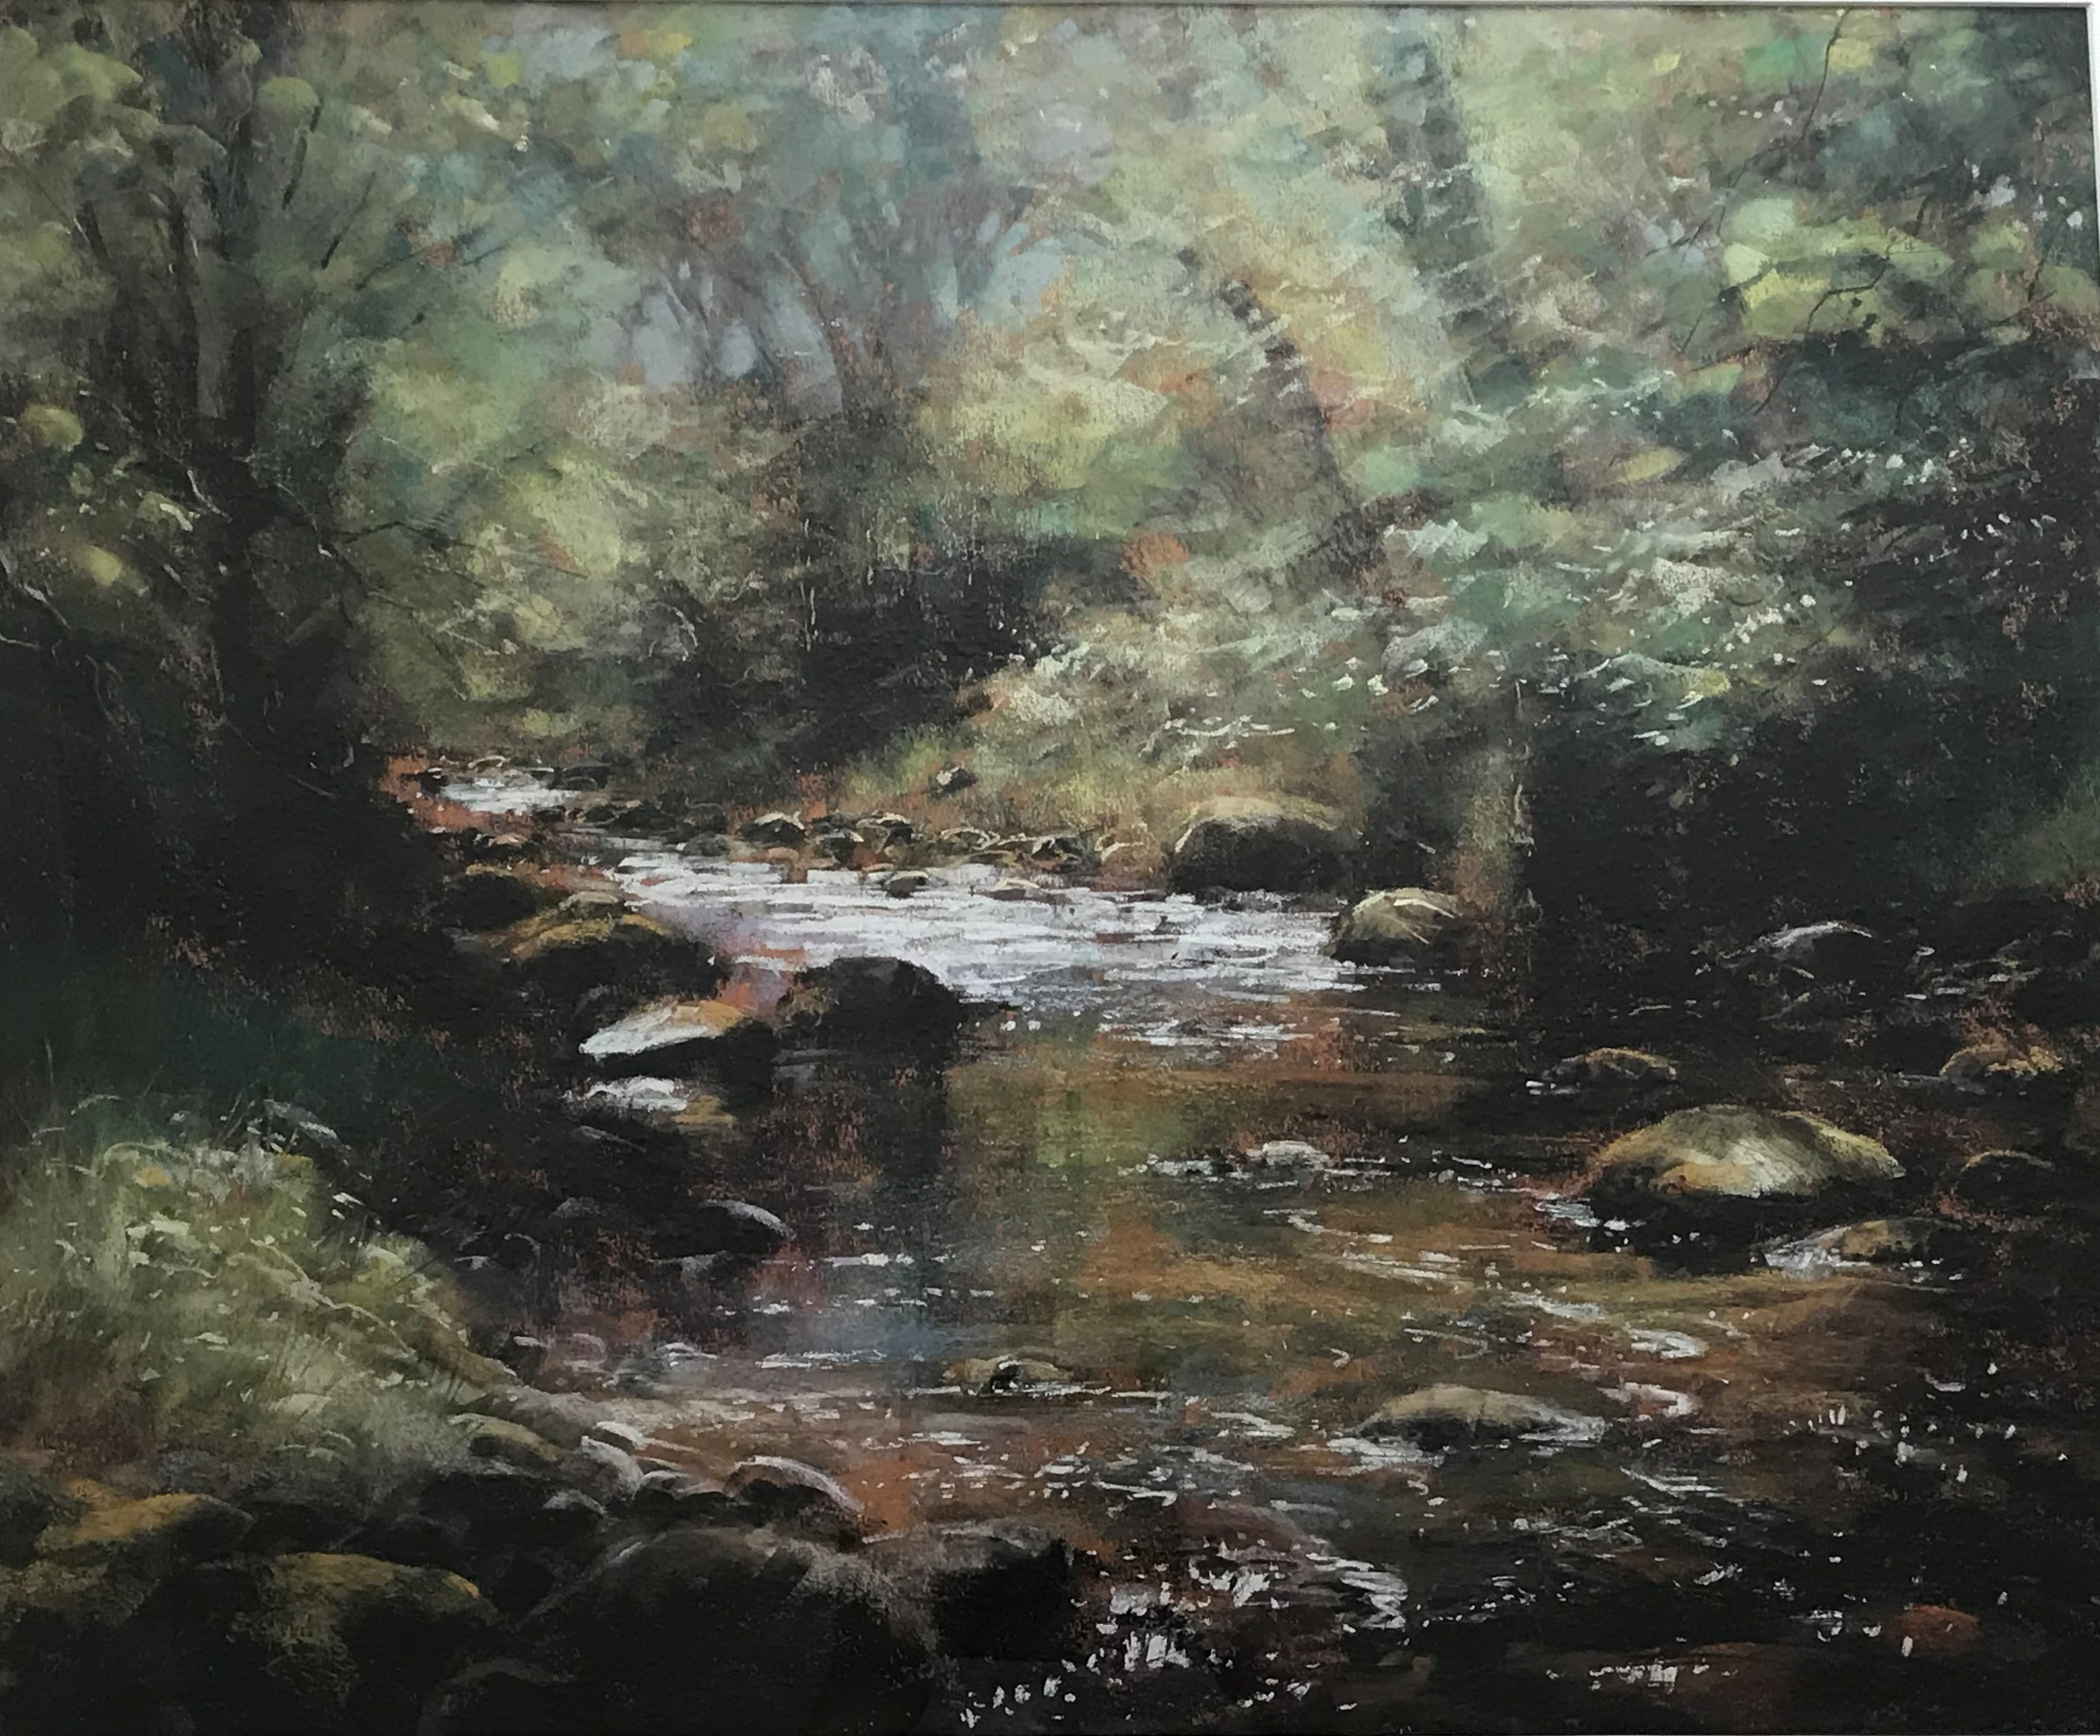 Forrest Stream in Dappled Sun pastel by Scottish artist Robert Turnbull 20th C